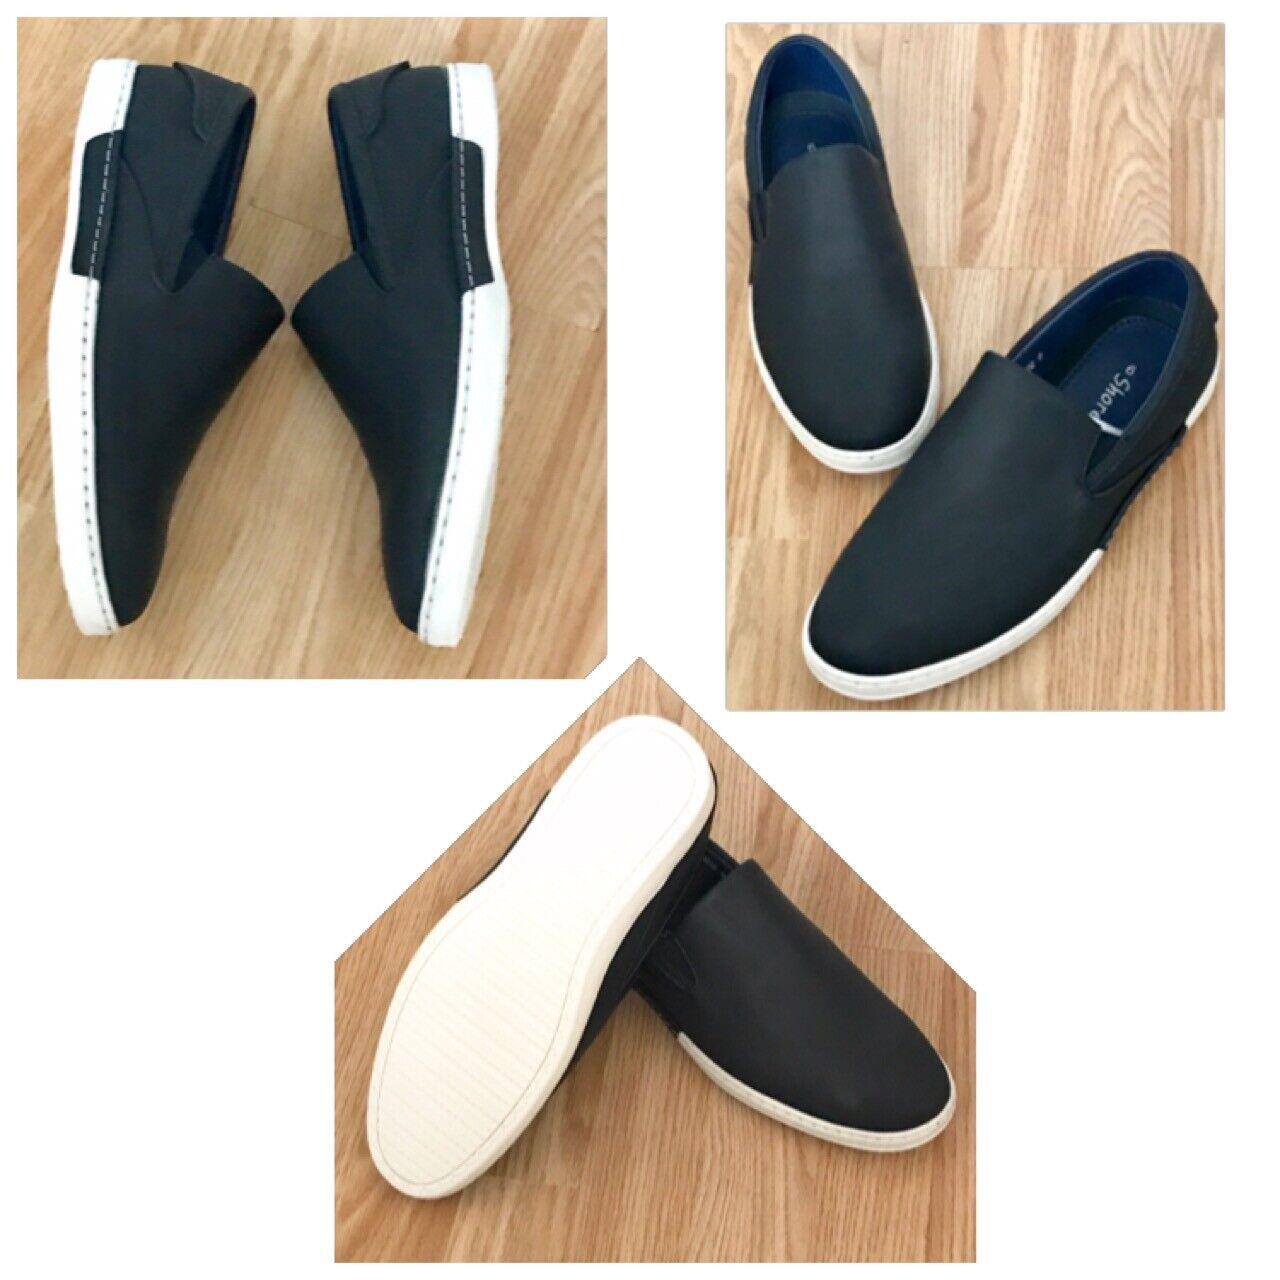 Men Vegan Navy Microfibre Orthopedic Diabetic Comfort Wide Trainer Shoe Size